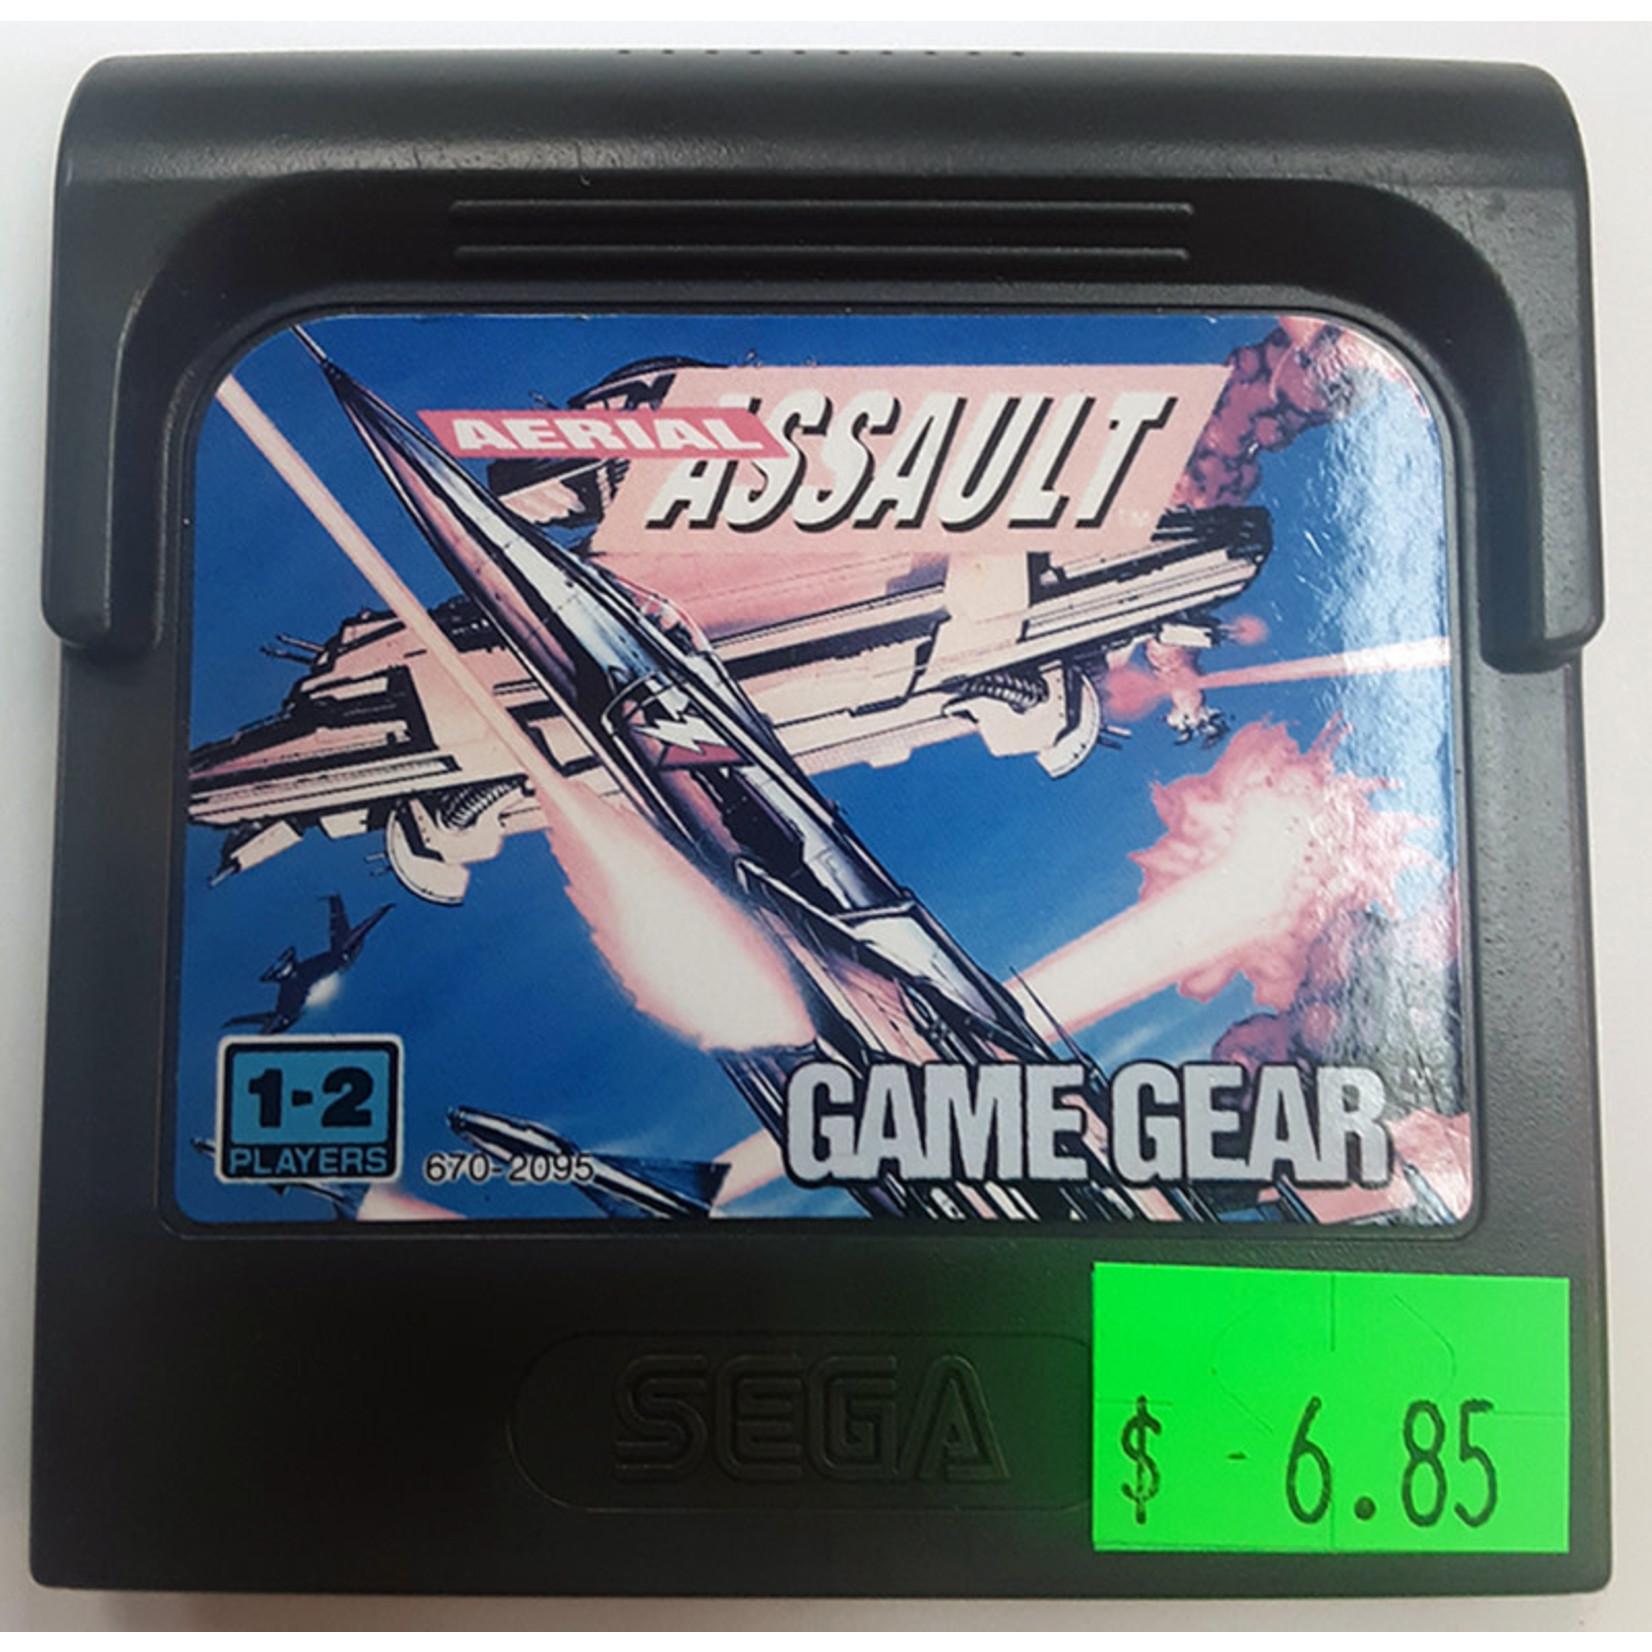 GGu-Aerial Assault